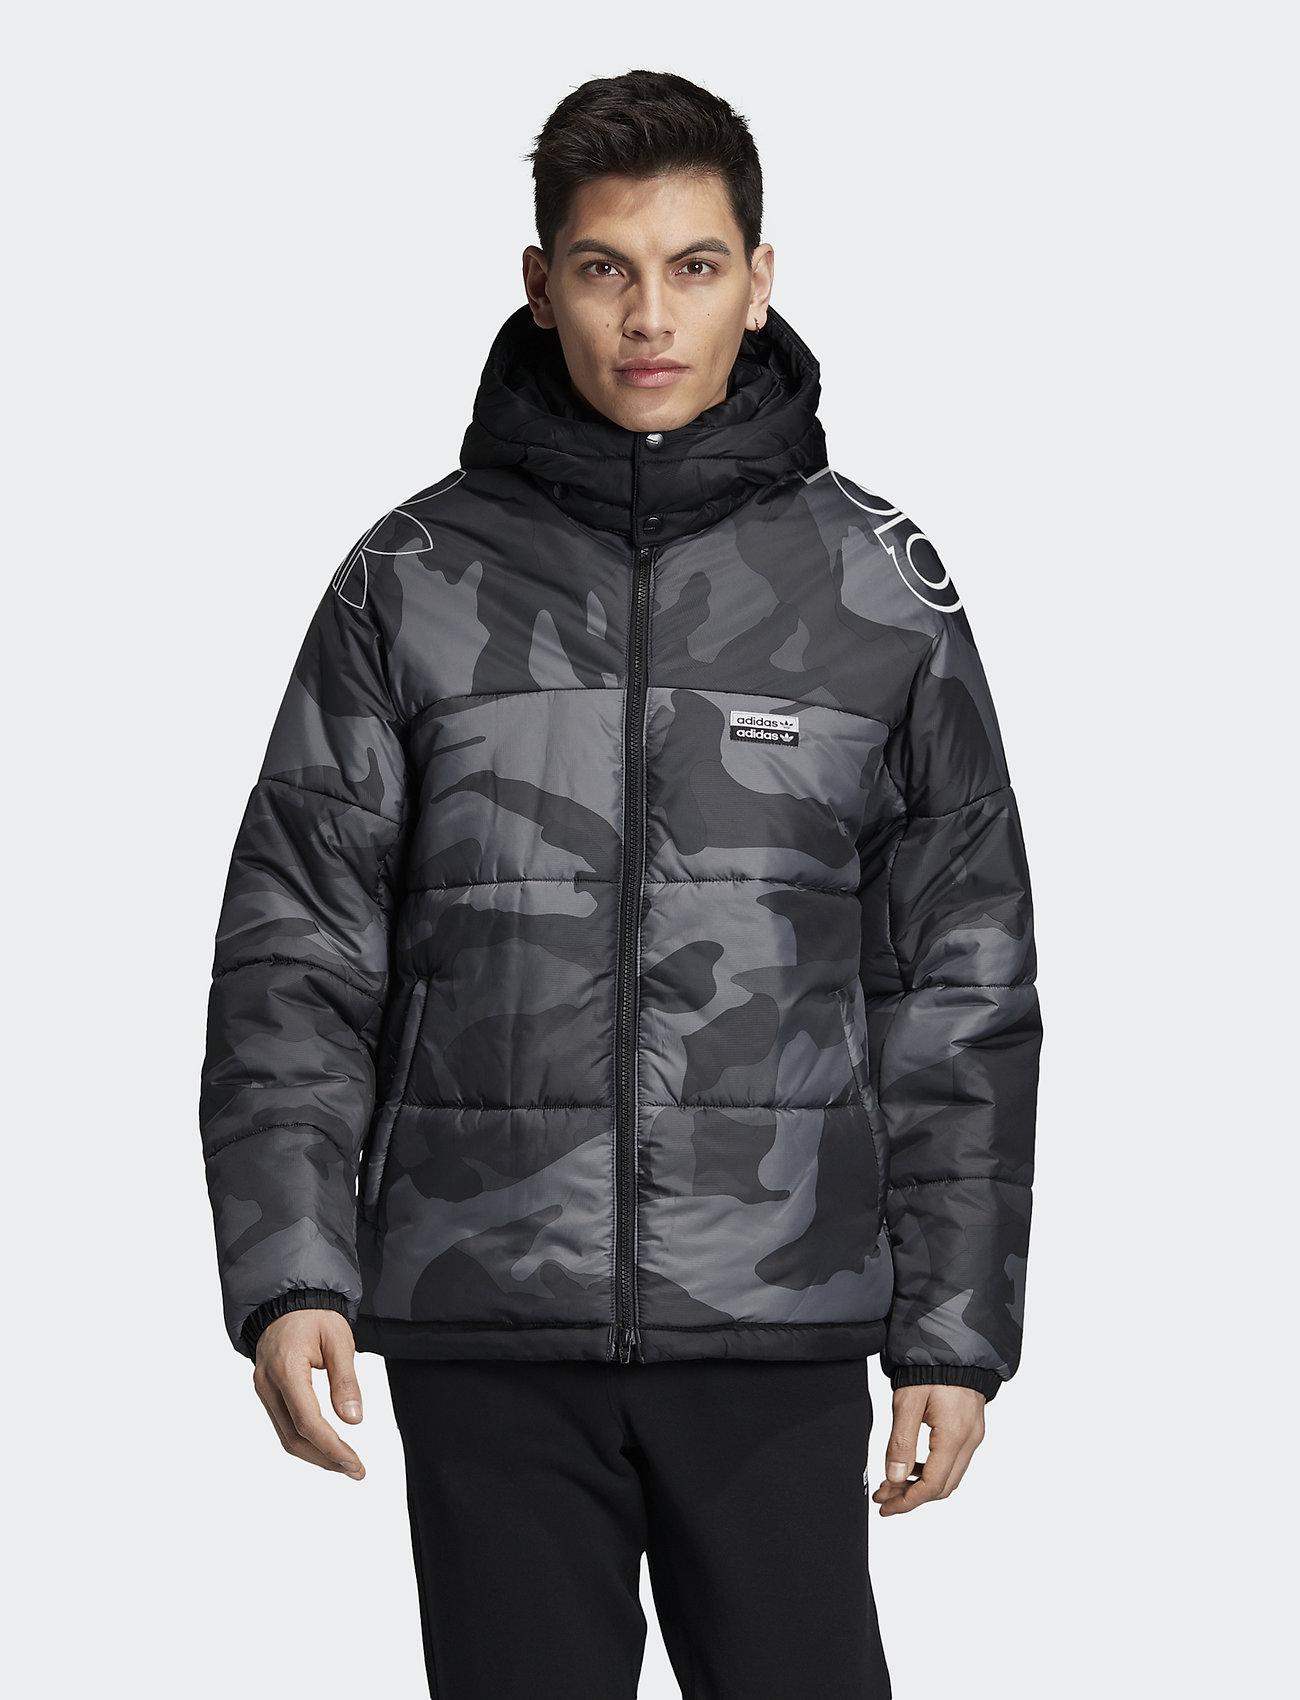 adidas Originals - VOCAL CAMO  JKT - athleisure jackets - multco/grefiv - 0